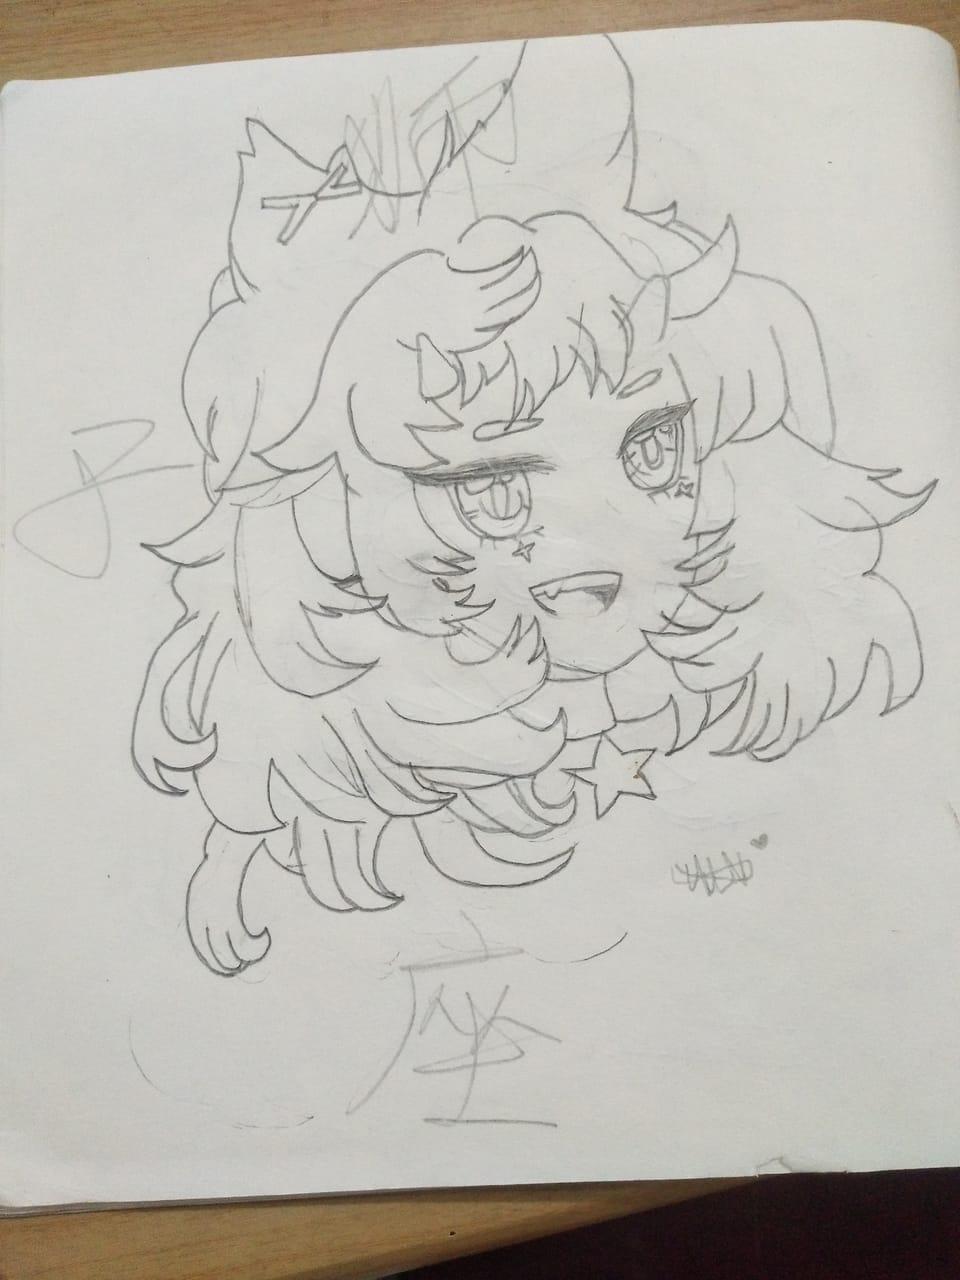 狮子座女孩✨ Illust of ꕥ᭄不亏不欠丫ꦿঞ February2021_Fantasy girl anime ꕥ᭄不亏不欠丫ꦿঞ AnalogDrawing